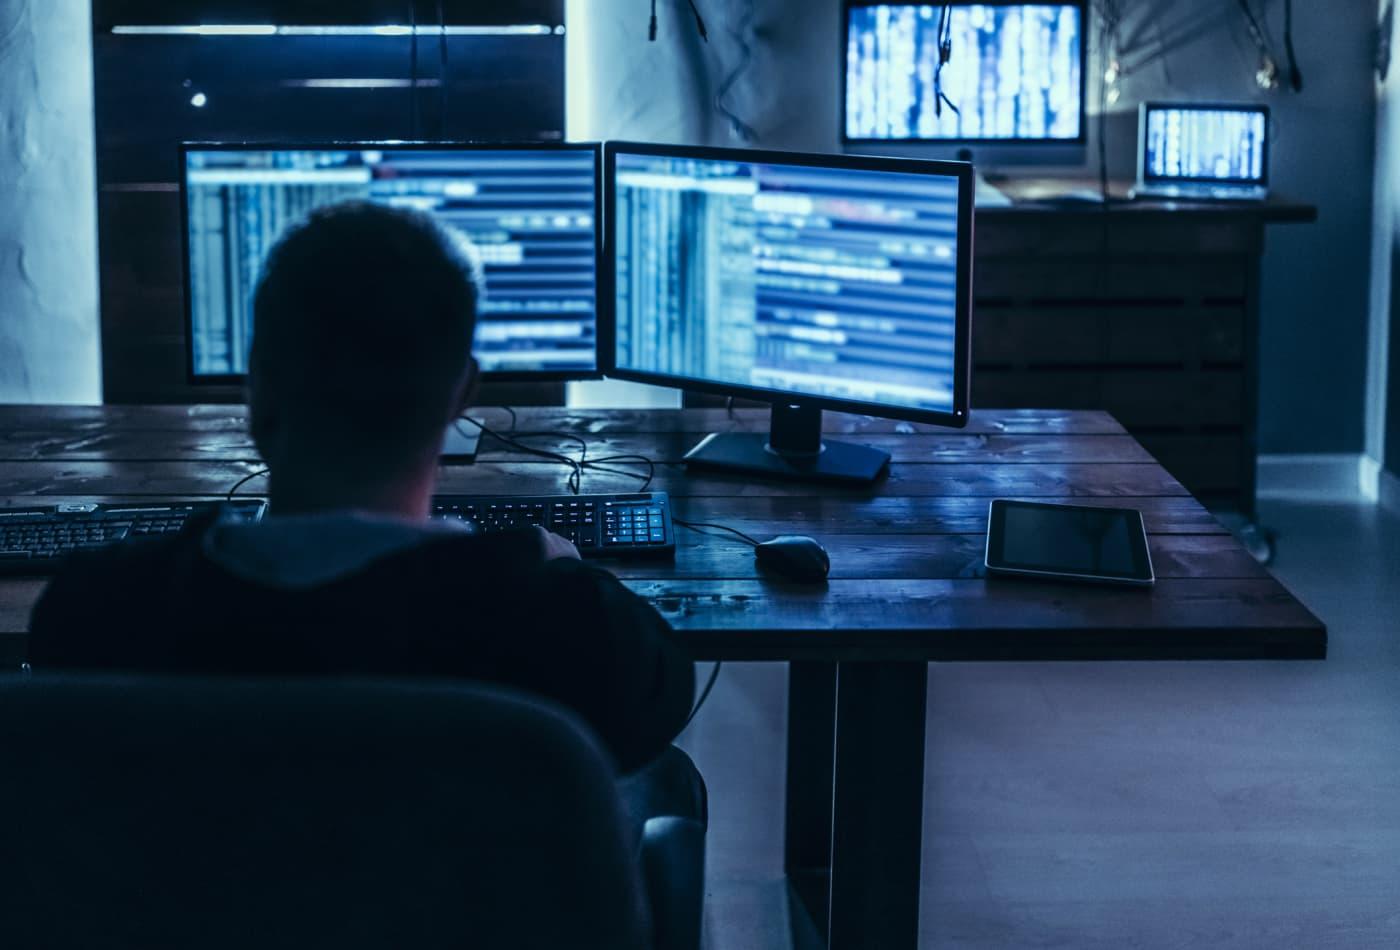 A.I. researchers urge regulators not to slam the brakes on its development